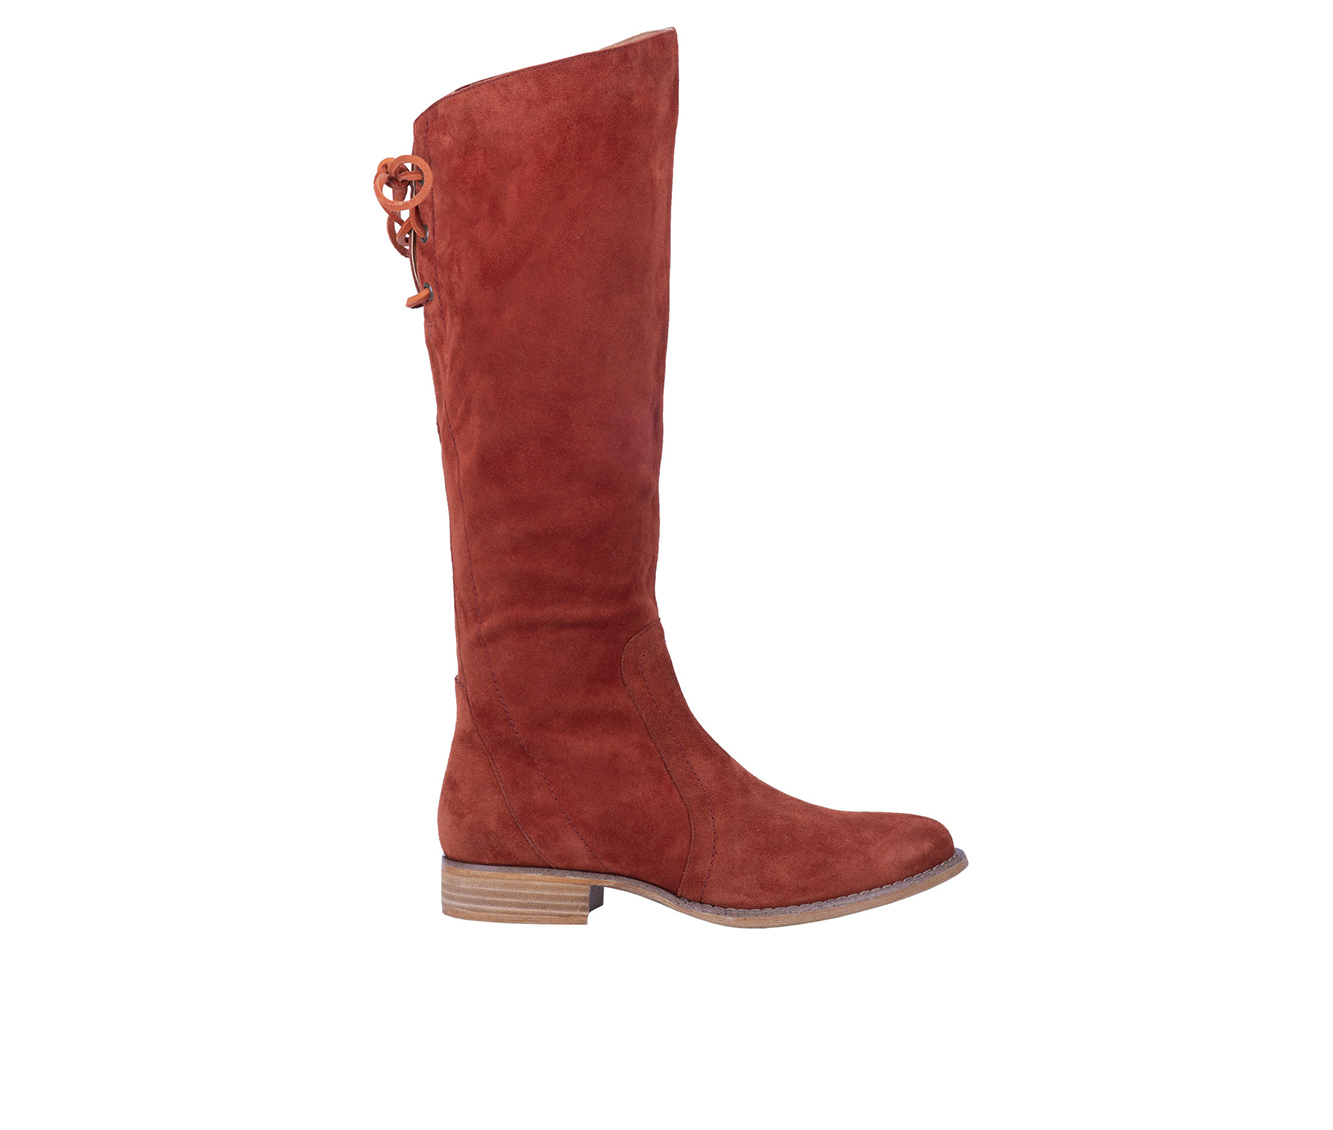 Dingo Boots Alameda Women's Boots (Orange - Leather)